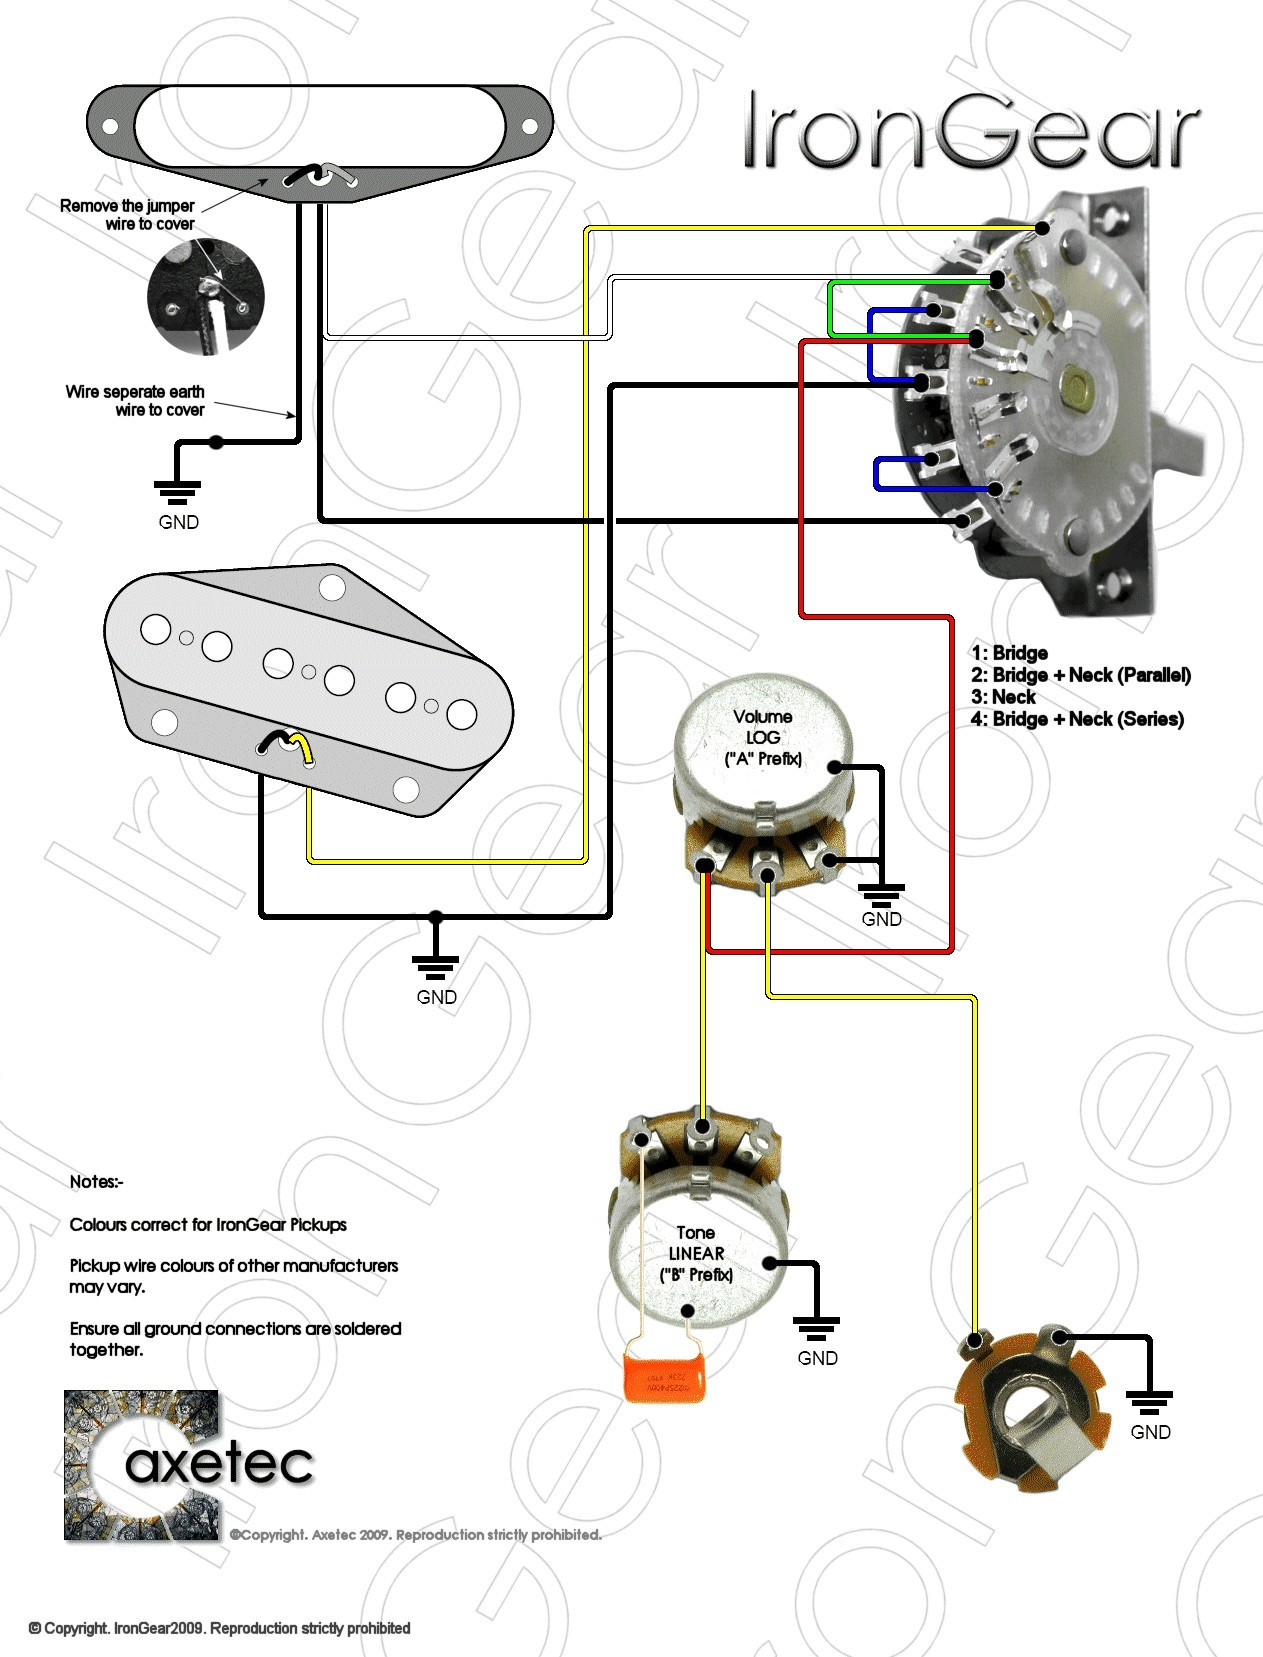 Wiring Diagram Guitar 3 Way Switch New 3 Way Toggle Switch Guitar Wiring Diagram Archives Wheathill Co